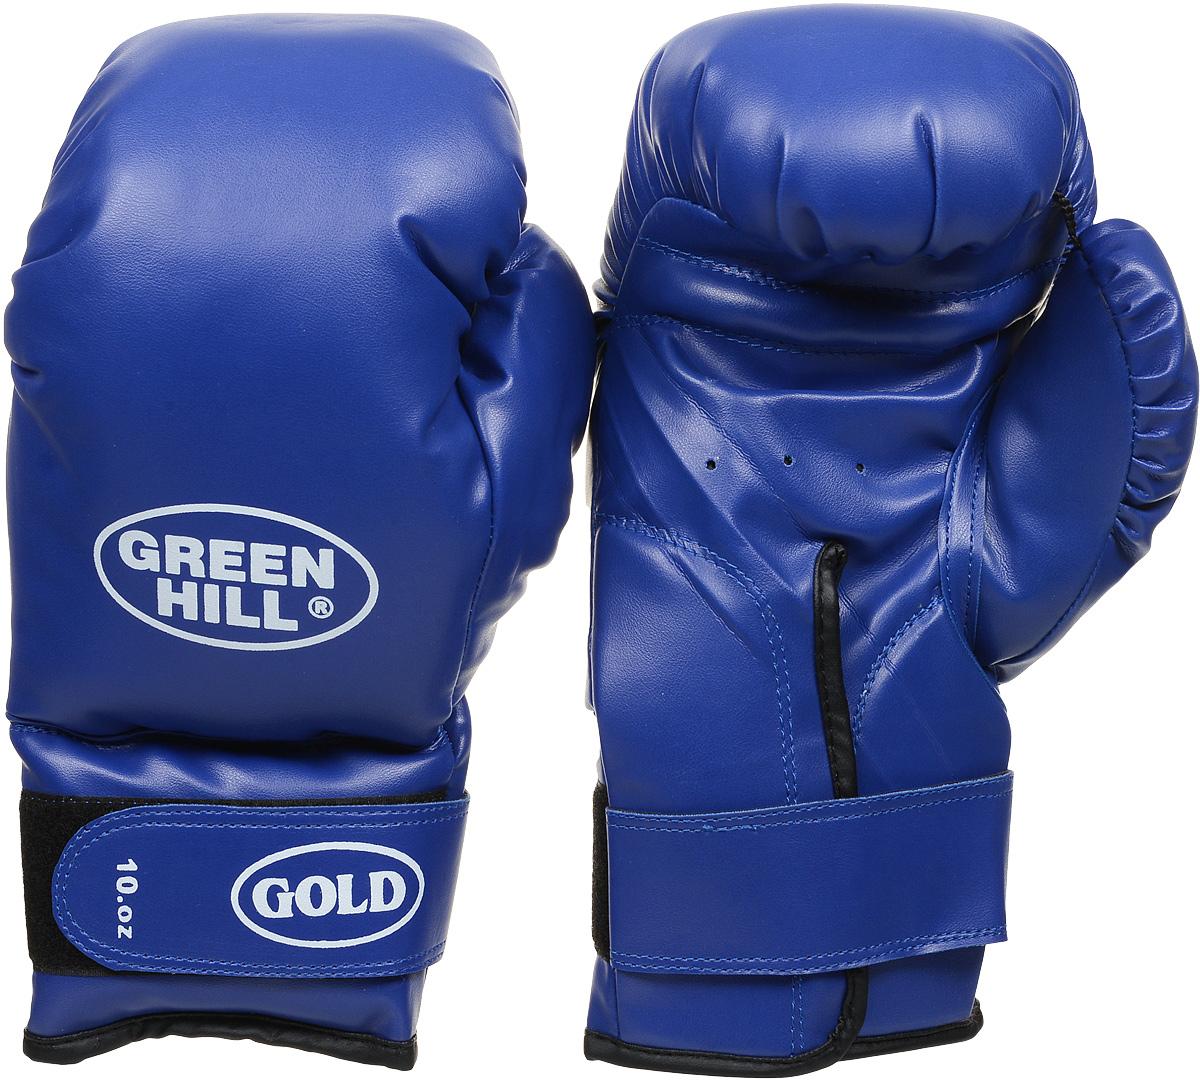 "Перчатки боксерские Green Hill ""Gold"", цвет: синий. Вес 10 унций BGG-2030"